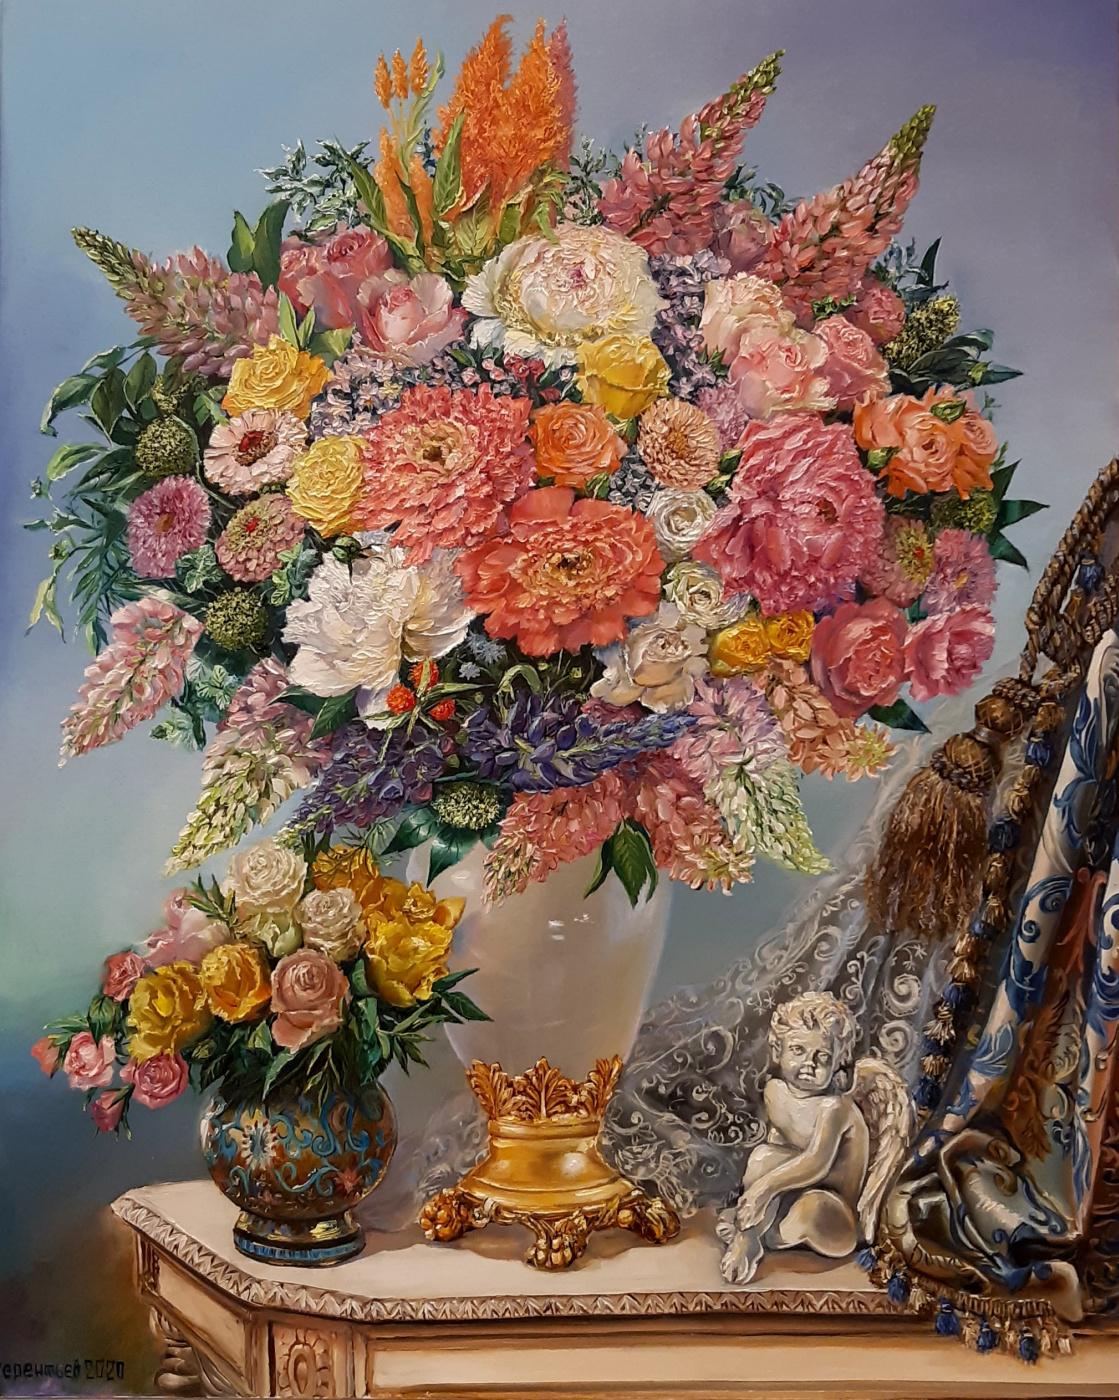 Evgeny Vladimirovich Terentyev. Bouquet with an angel